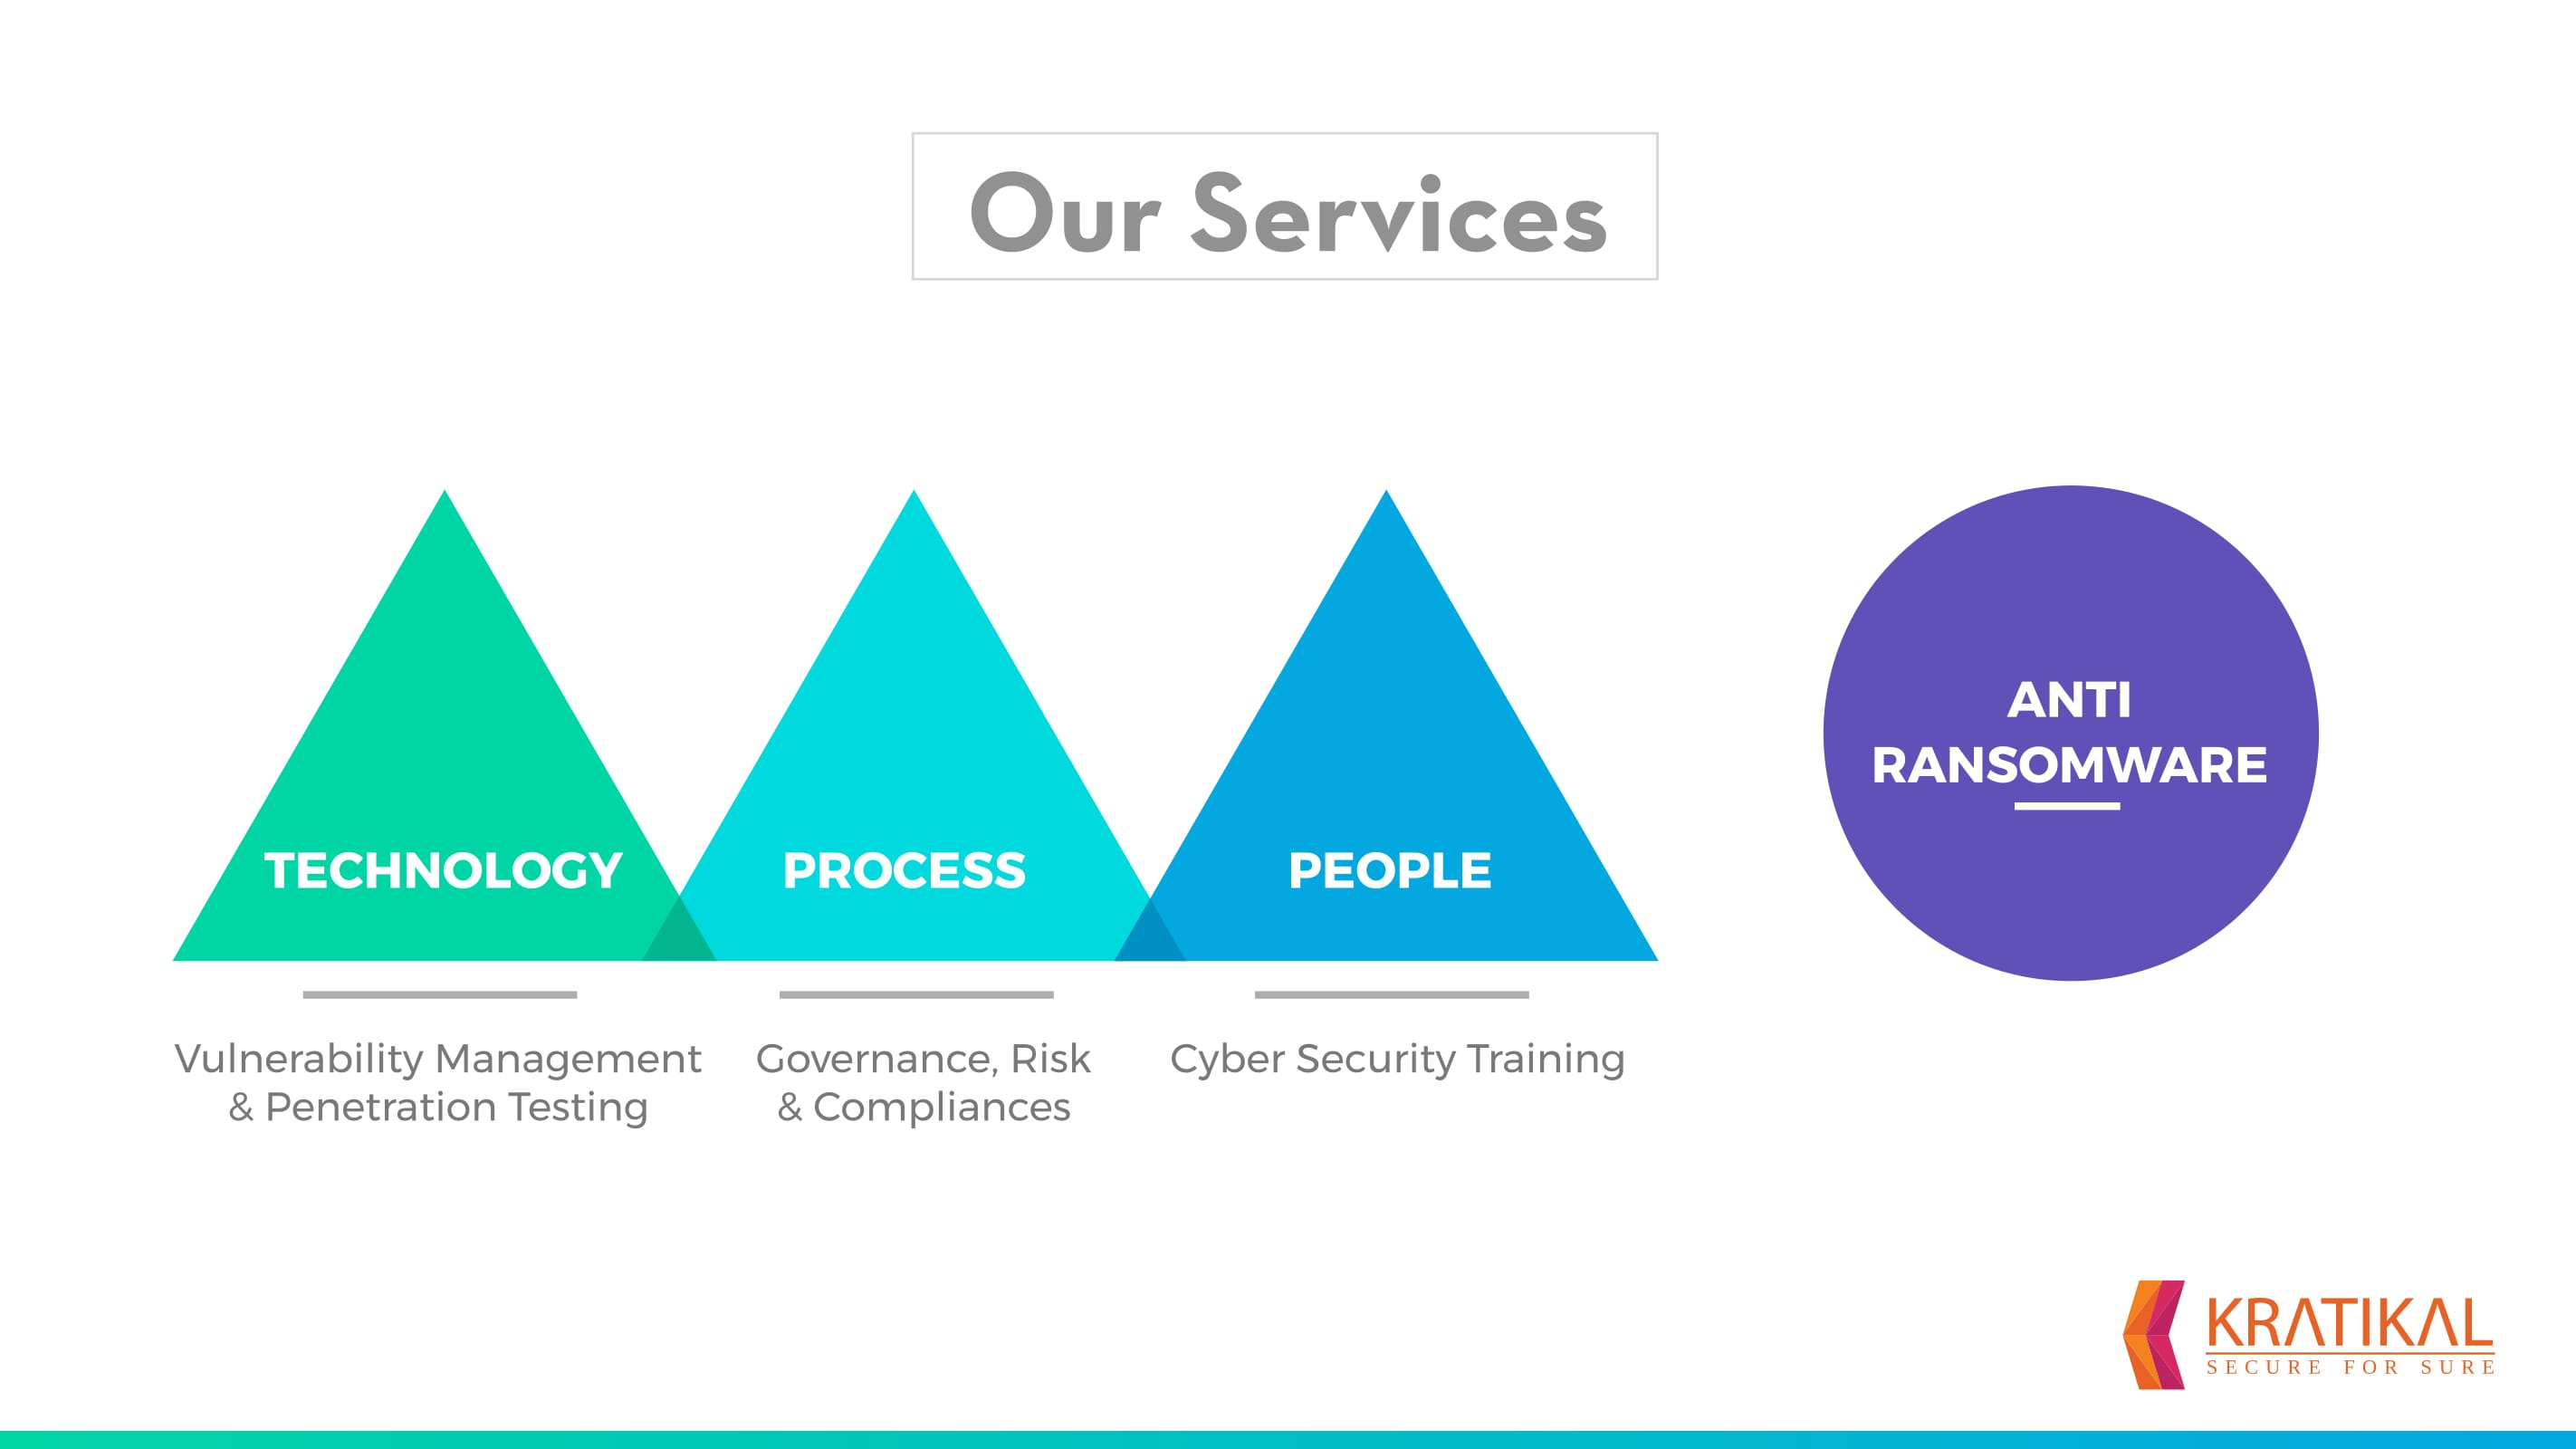 Kratikal Company Profile